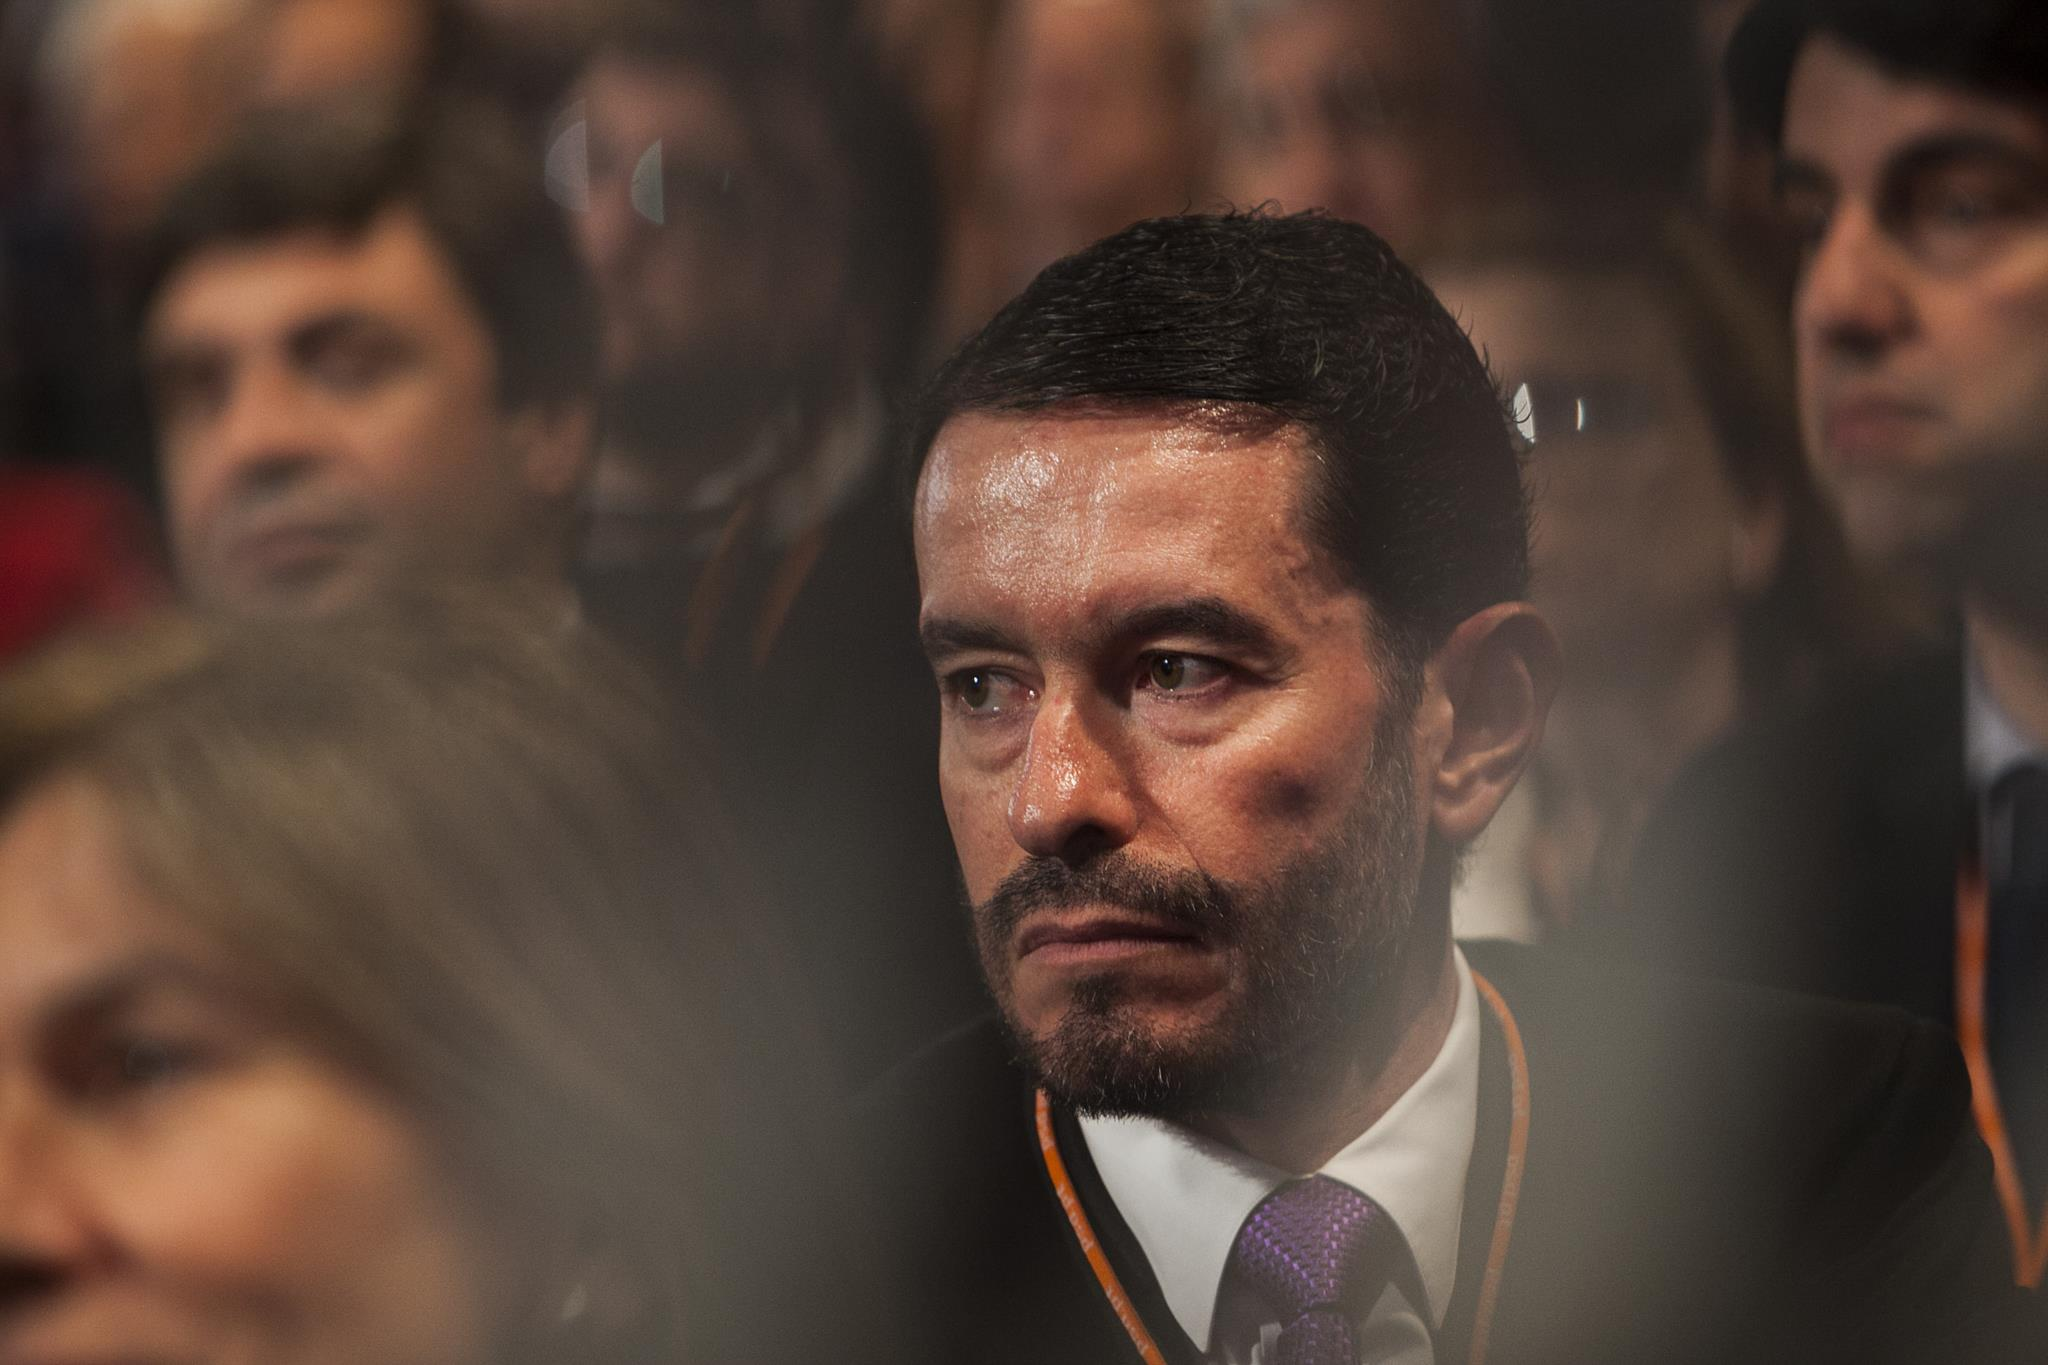 PÚBLICO - Miguel Frasquilho deverá ser <i>chairman</i> da TAP